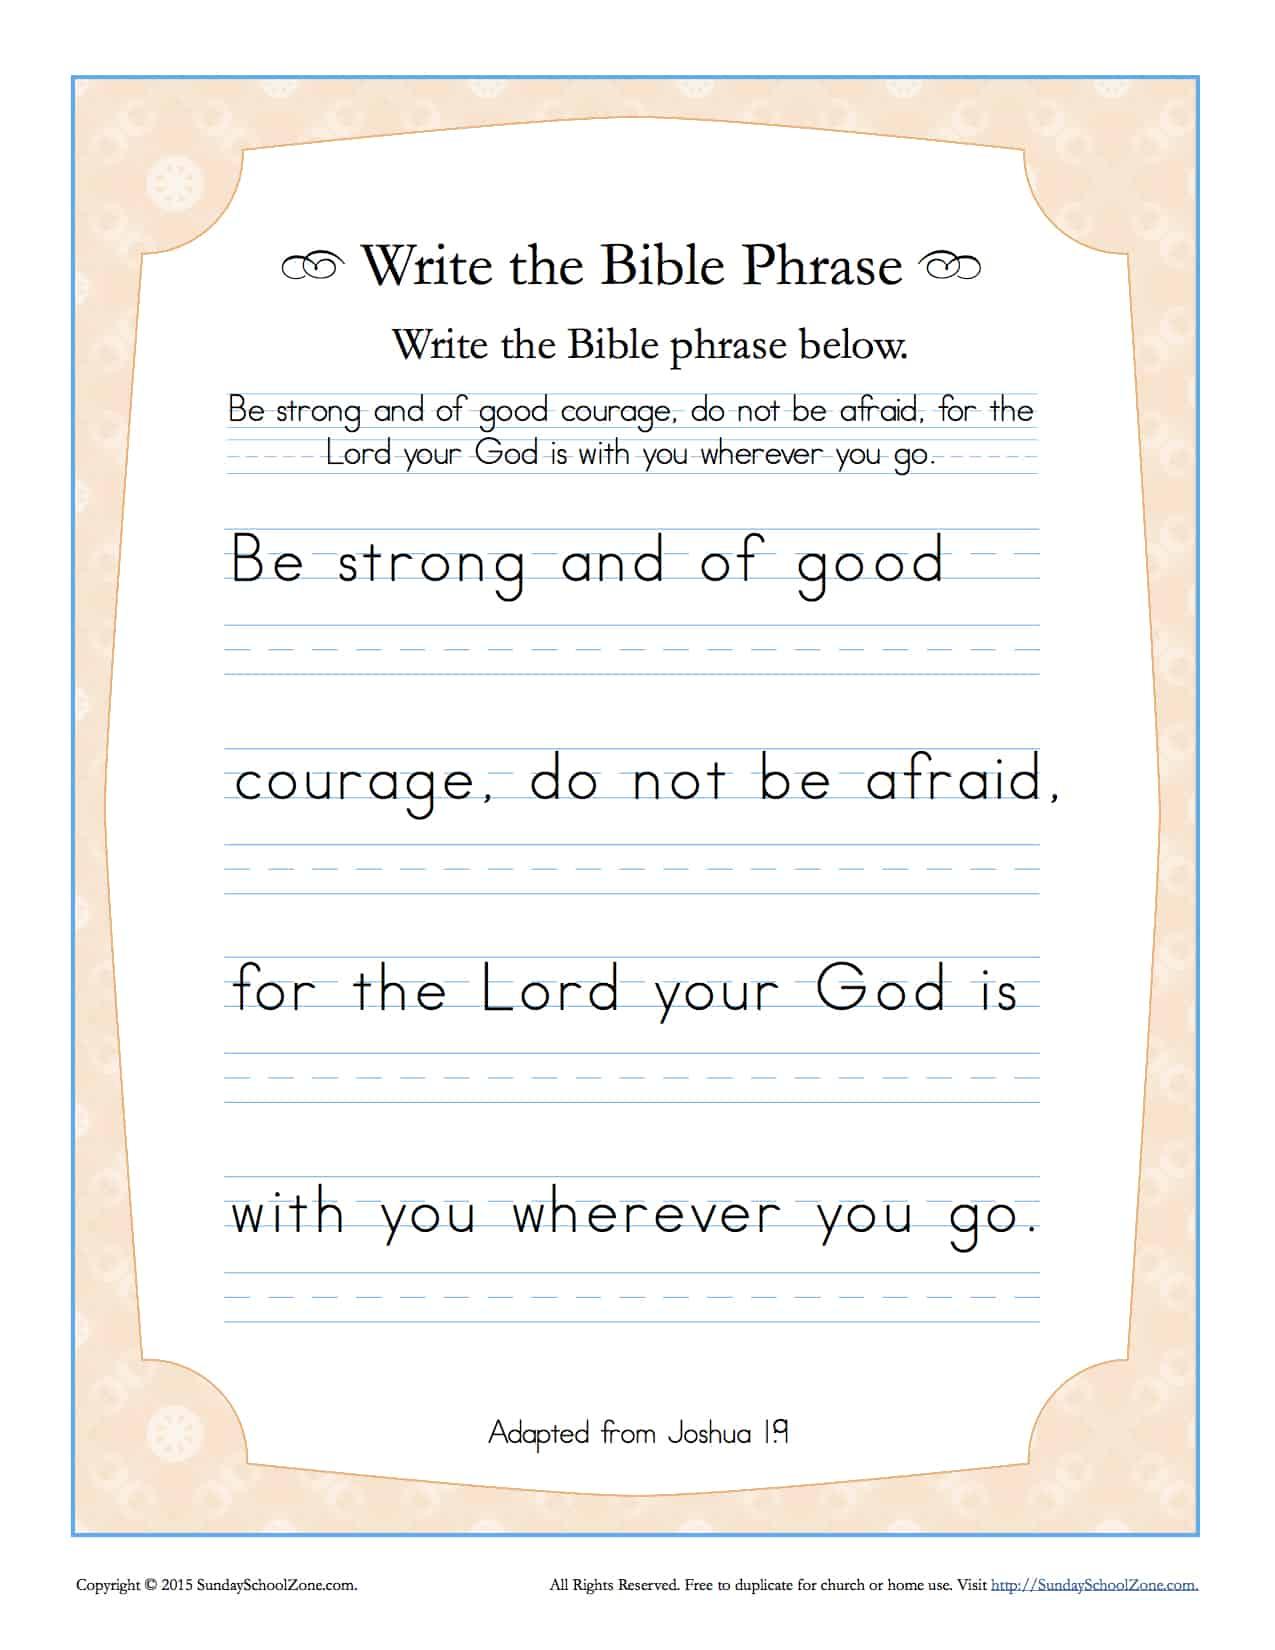 Worksheets Courage Worksheets joshua 19 write the bible phrase worksheet